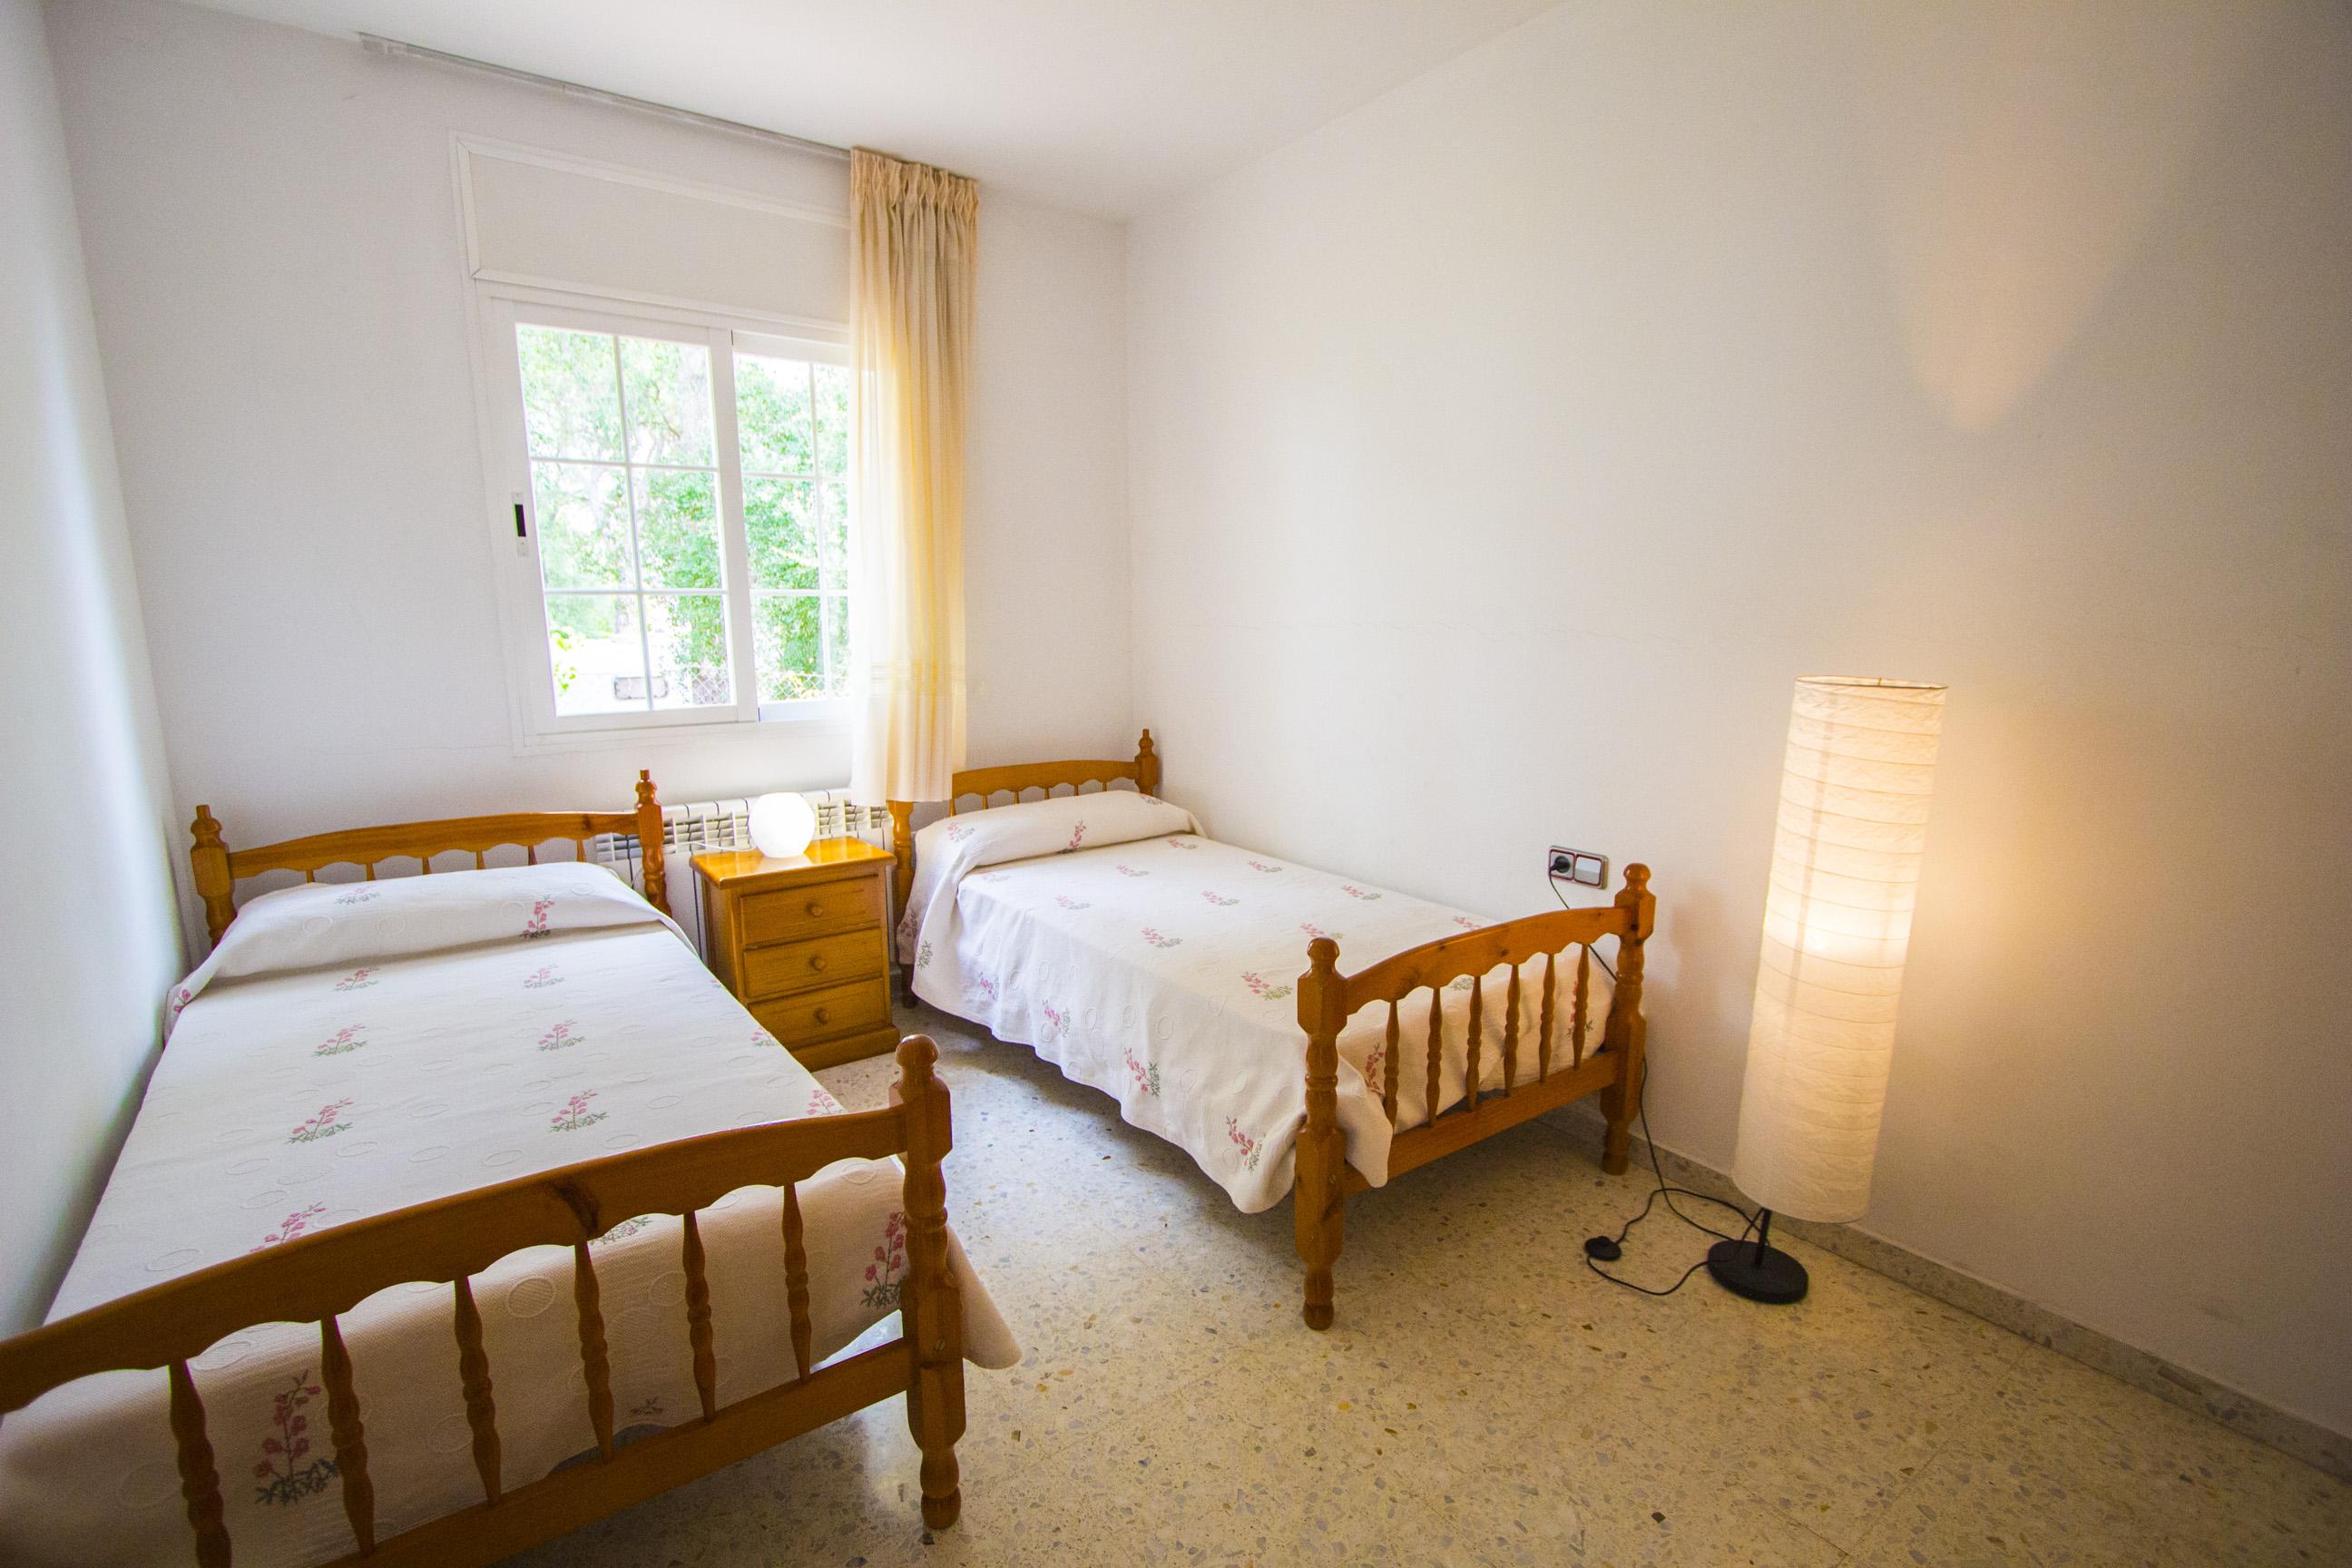 Ferienhaus Catalunya Casas: Peaceful Villa Sils, just 20 km from Costa Brava beaches! (2302155), Les Mallorquines, Girona, Katalonien, Spanien, Bild 20